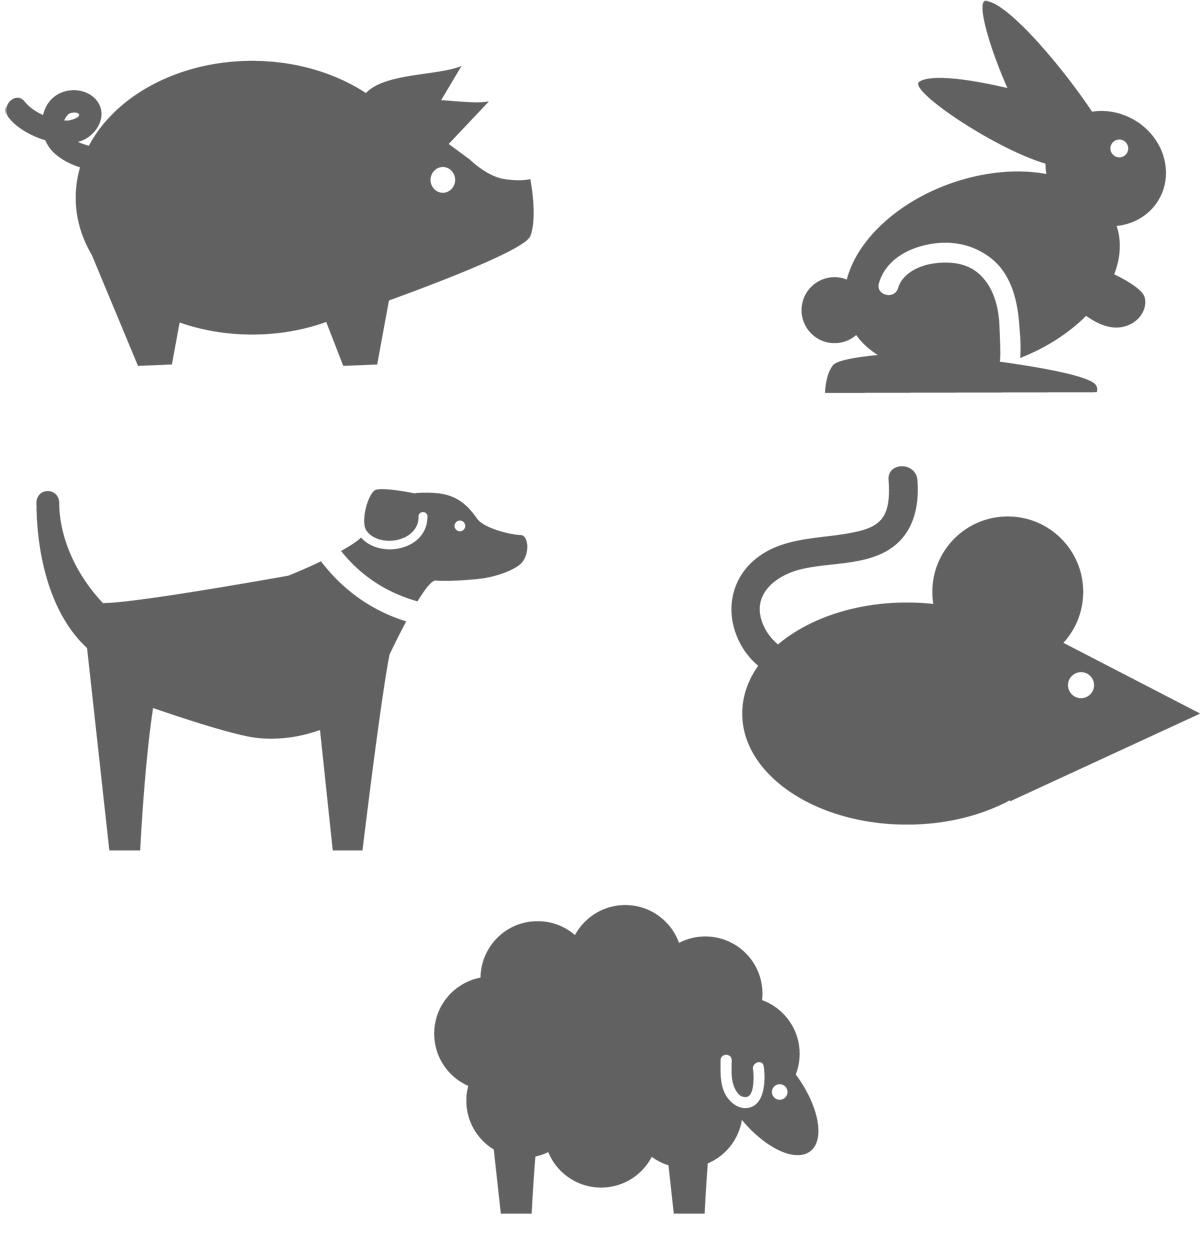 Custom Icons: ImageTrend